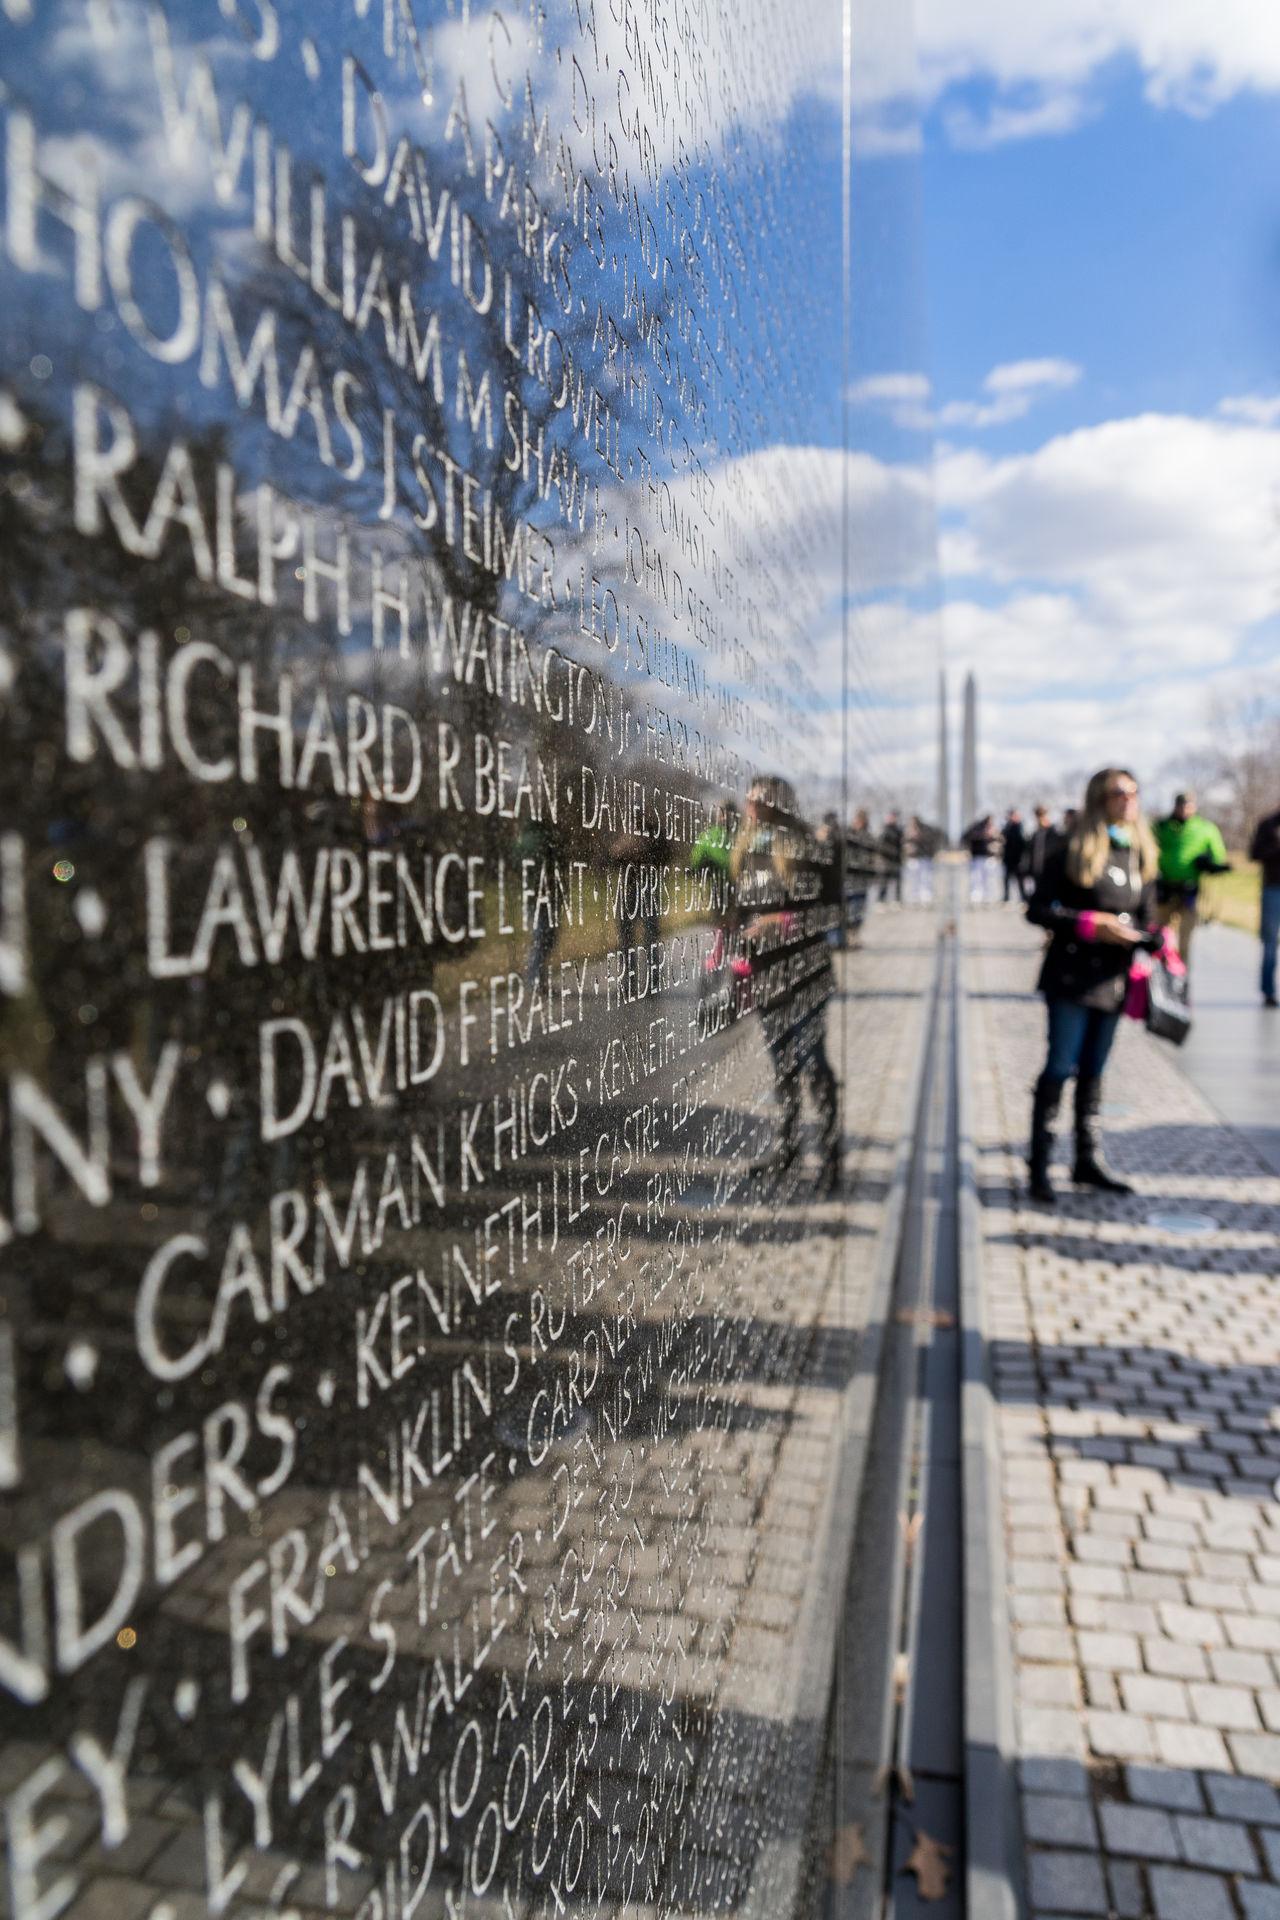 America Capital Cities  D.C. Day Fallen Hand Memorial Names Reflections Sightseeing Soldier USA Vietnam Vietnam War Memorial Wall War Washinton The City Light Washington, D. C.